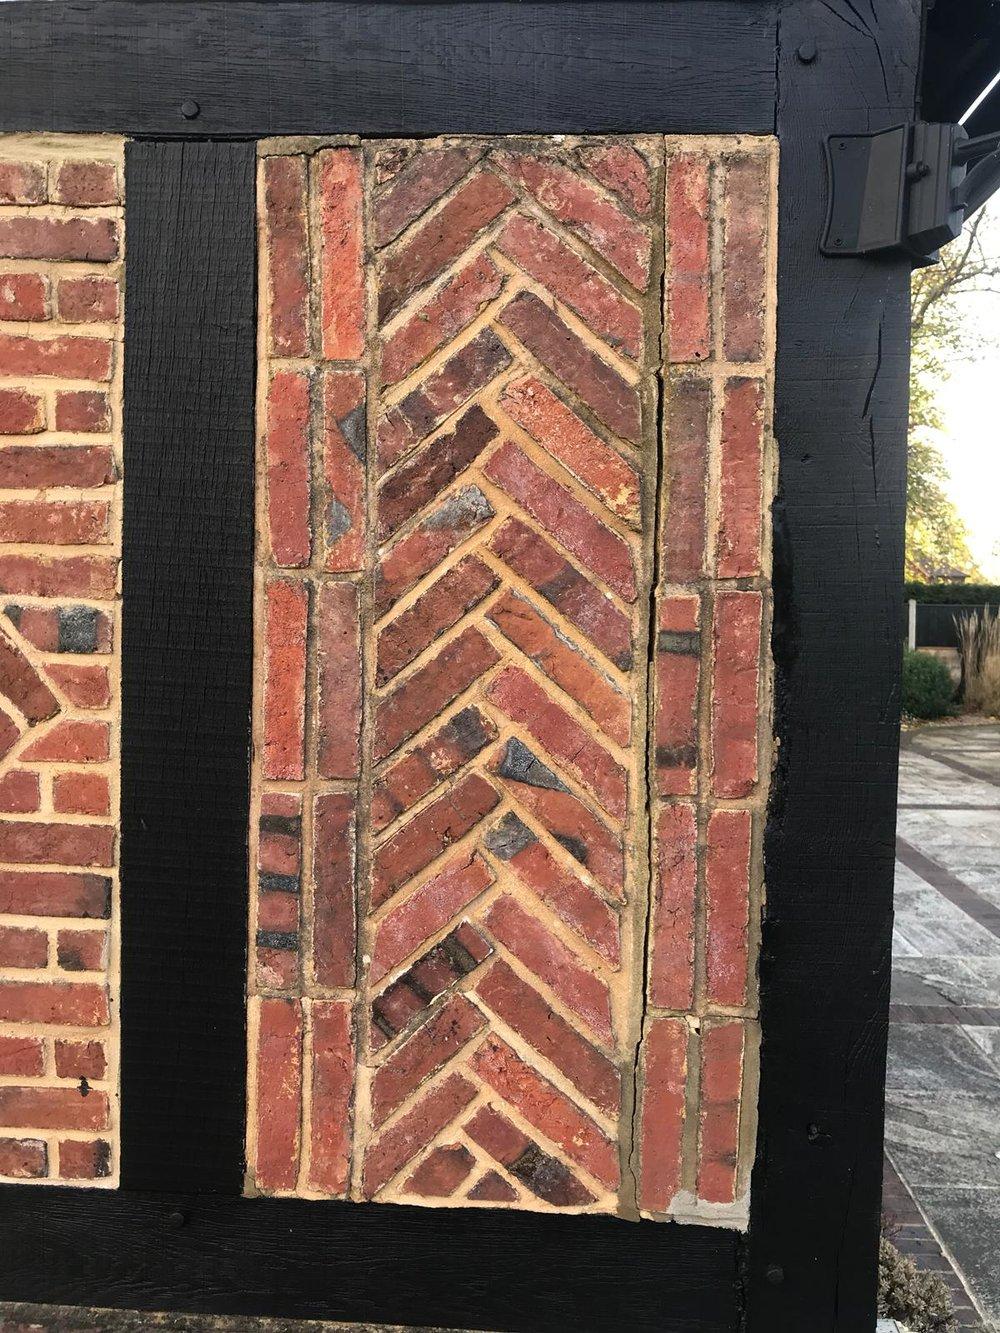 Brick Restoration Project 4 - Before